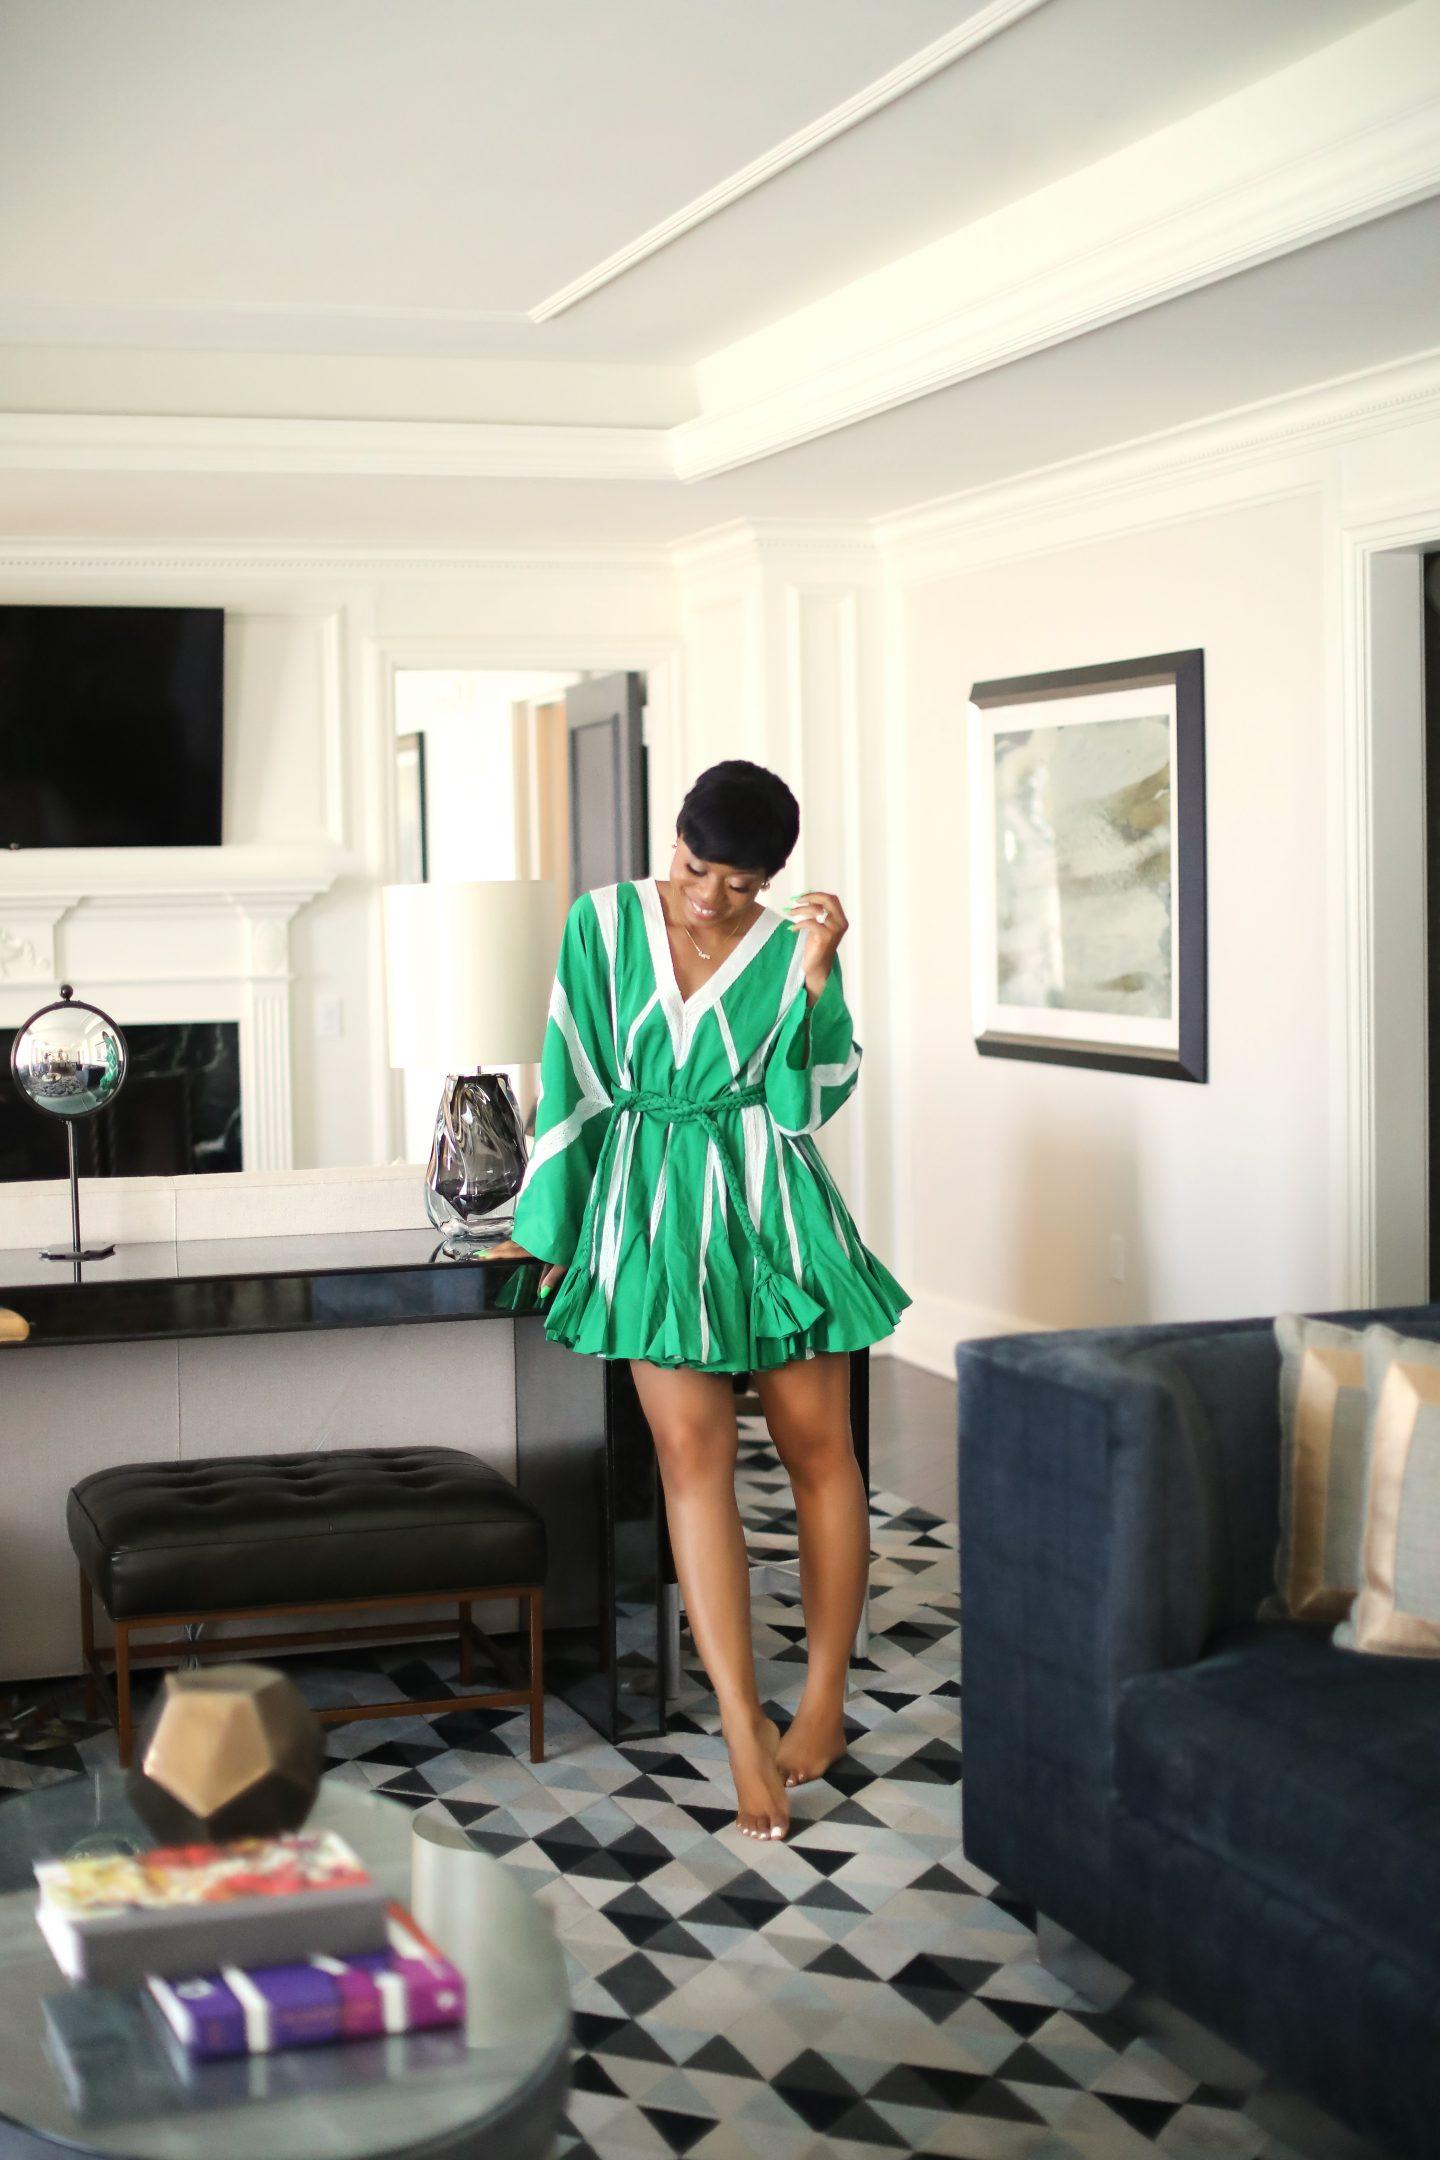 Stella-adewunmi-of-jadore-fashion-blog-the-perfect-weekend-getaway-in-virginia-to-book-now